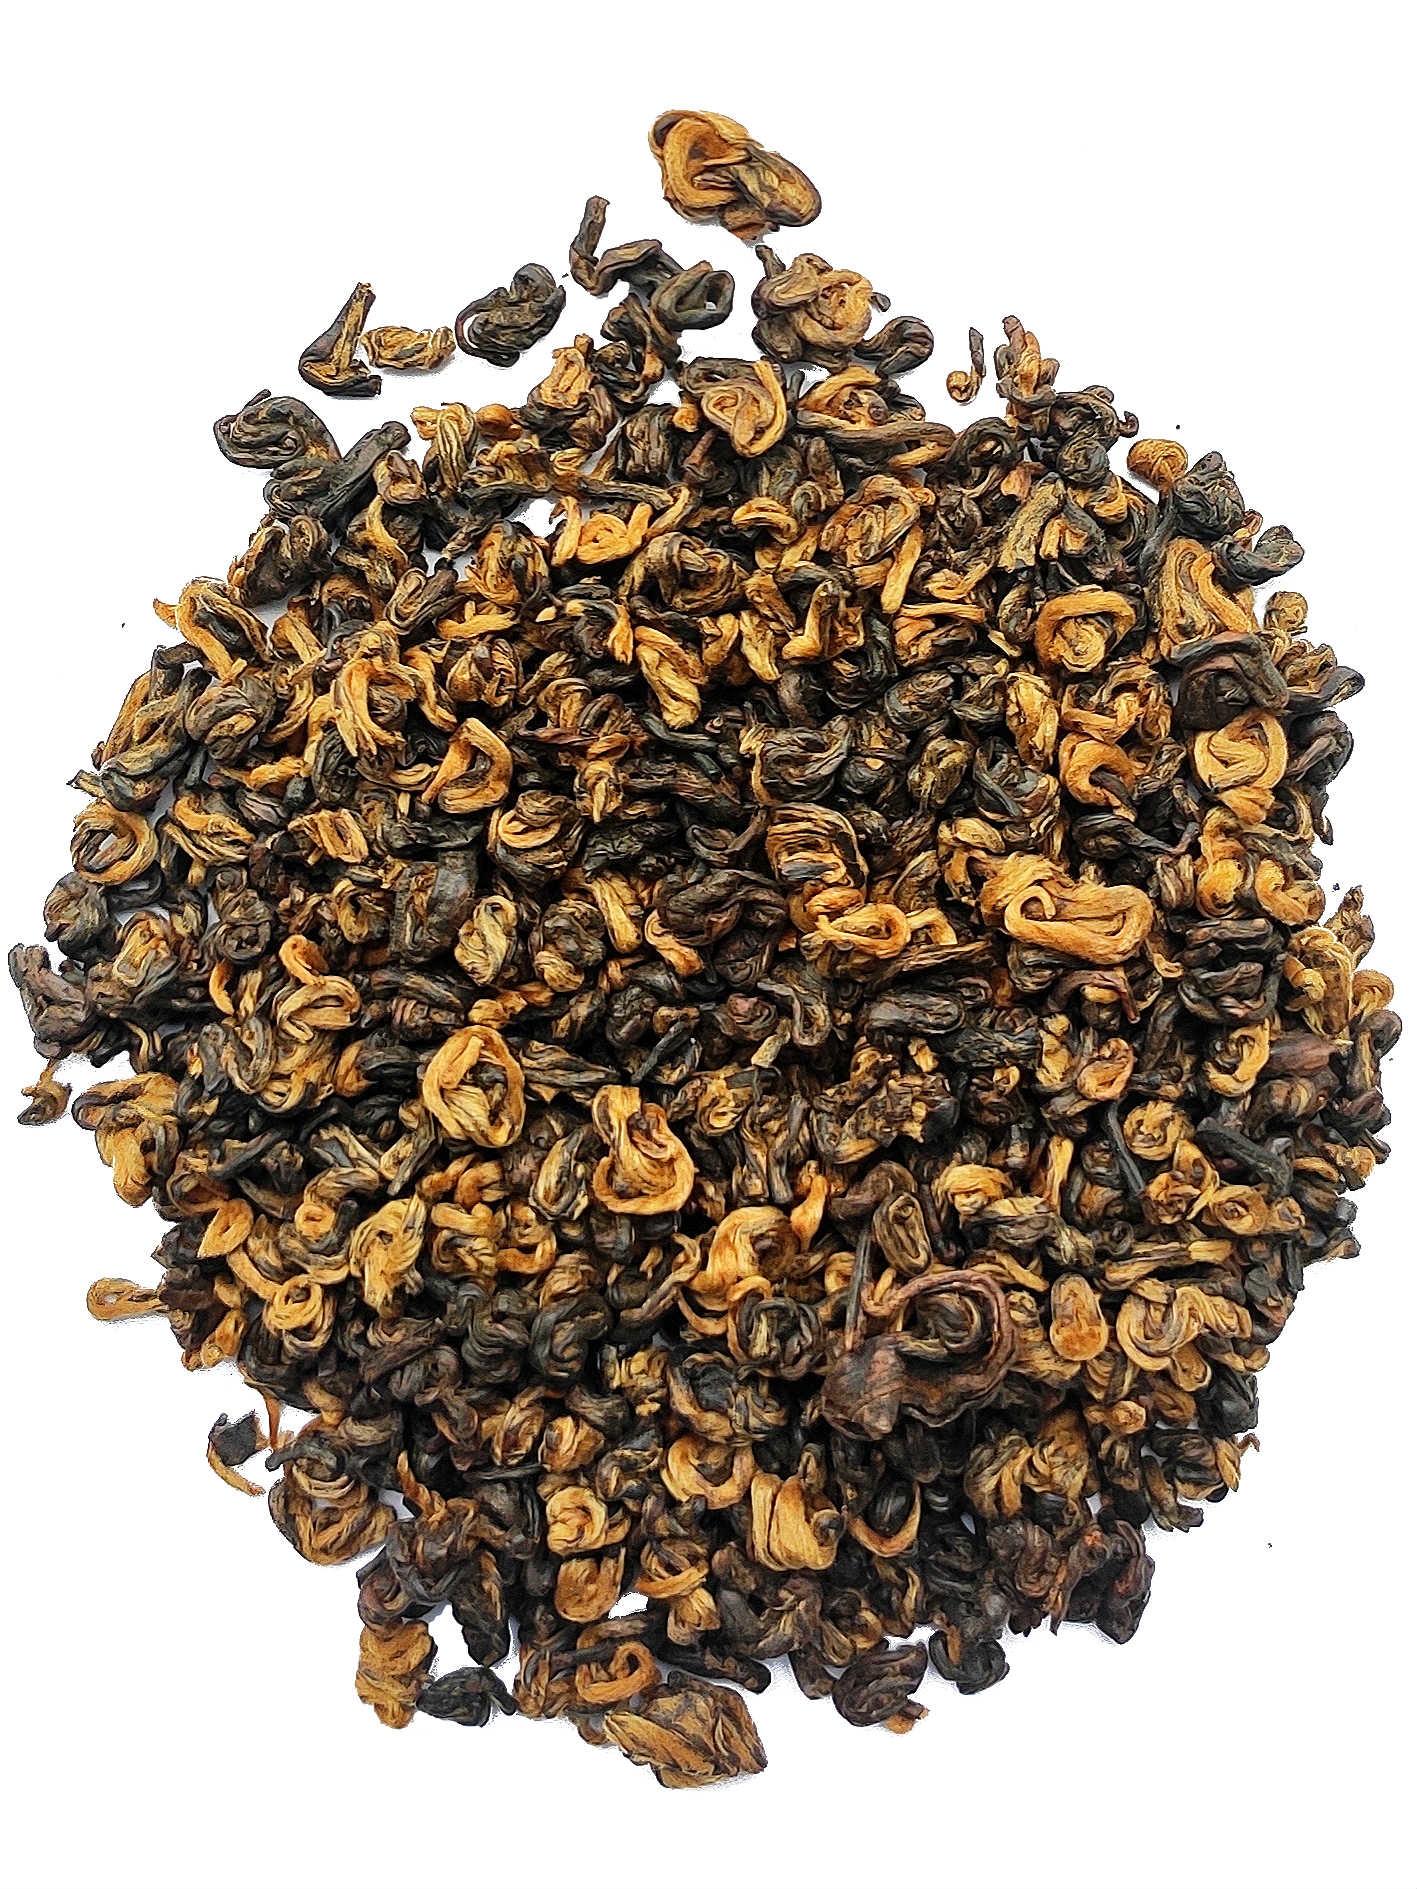 Zwarte thee China Golden Snail 1st Grade BIO-1